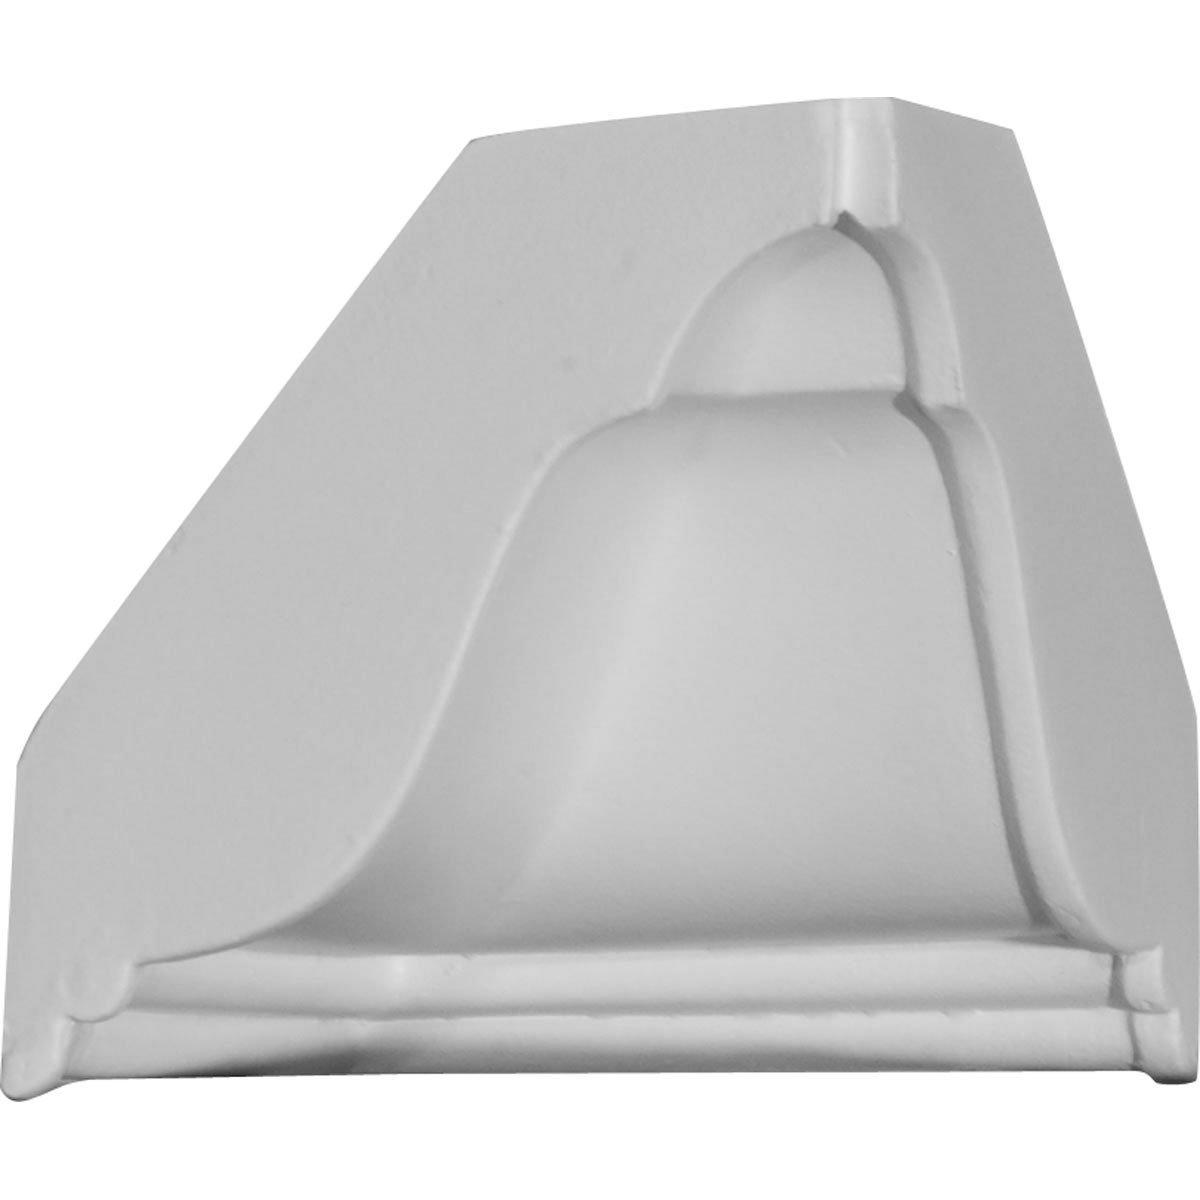 "Ekena Millwork MIC04X04BX Inside Corner for Moulding Profiles, 4 3/4""W x 4 7/8""H, White"